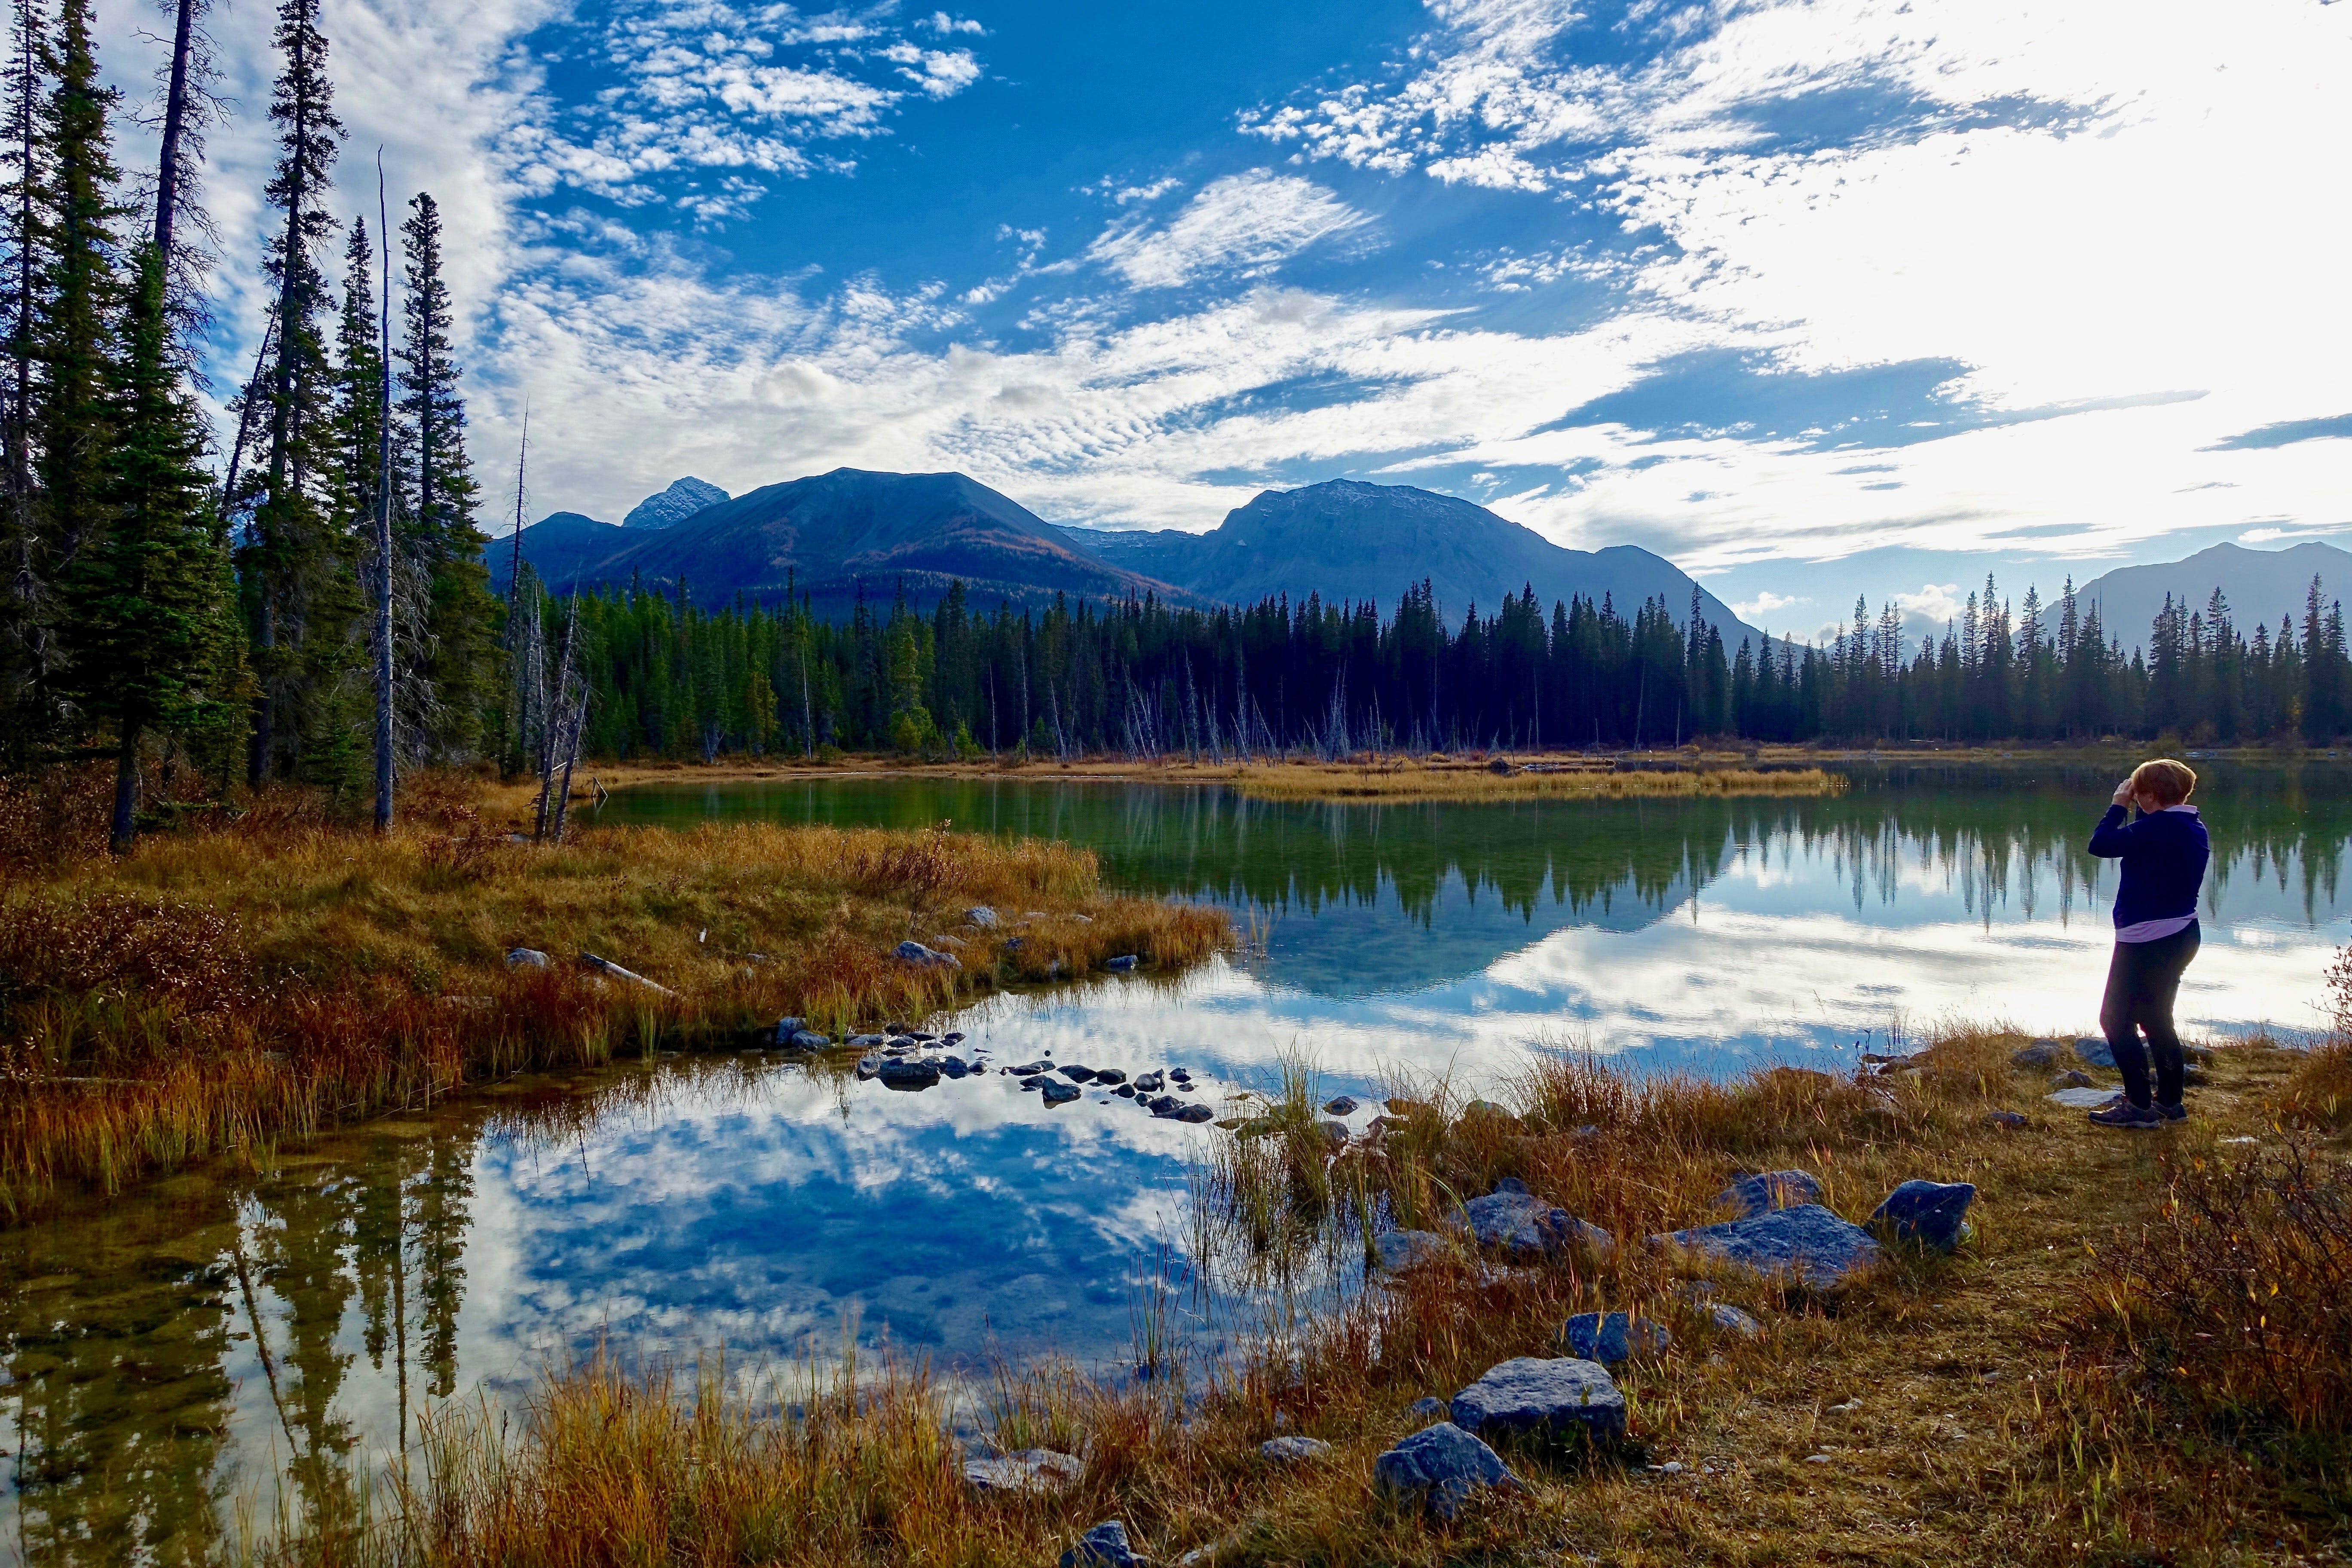 Kostenloses Stock Foto zu bäume, berg, friedlich, friedvoll